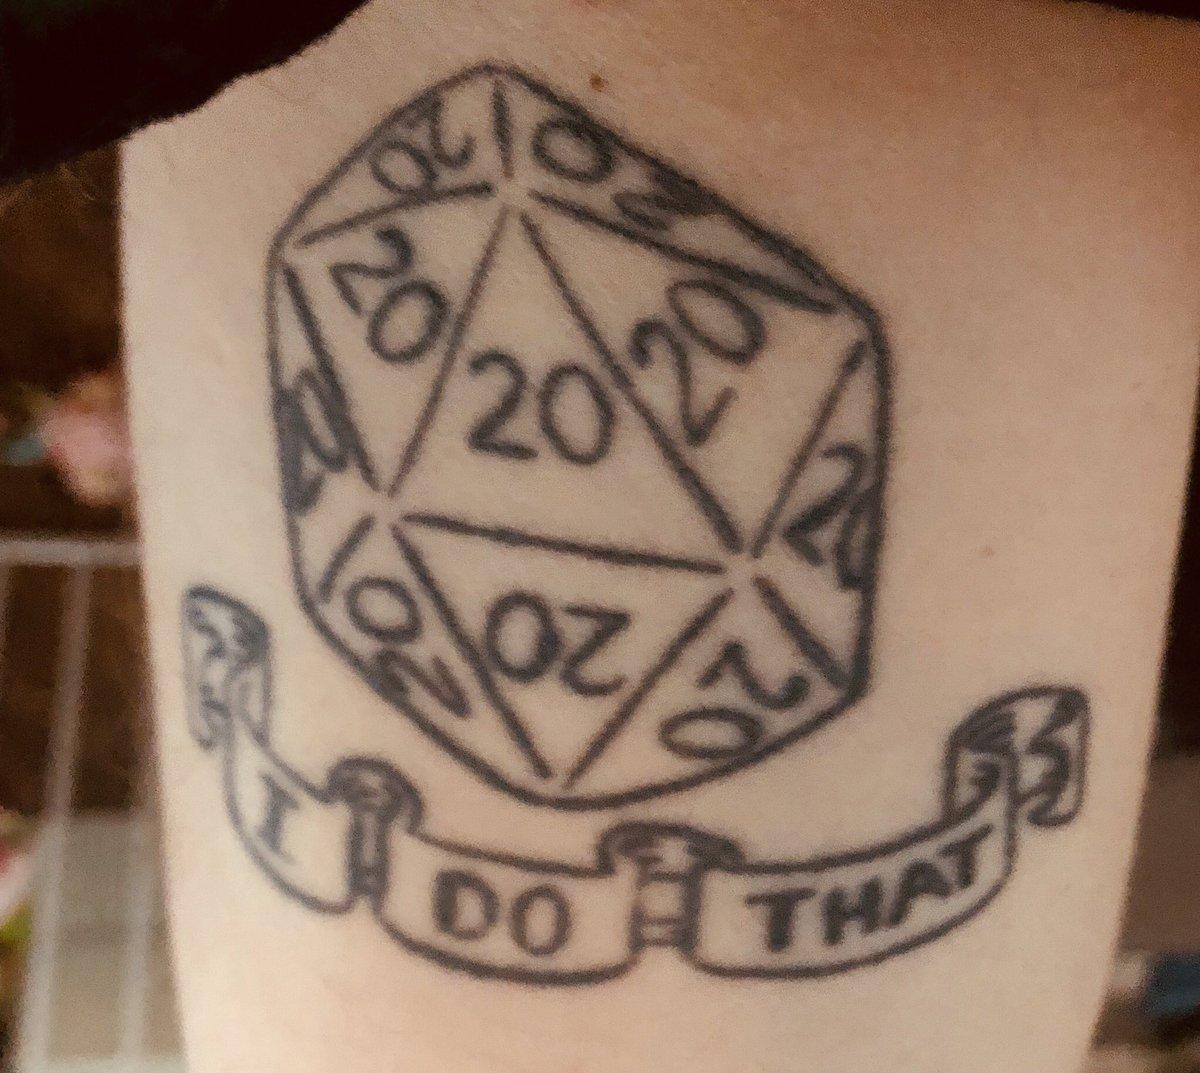 Travis Mcelroy The Internet S Best Friend On Twitter A Tattoo